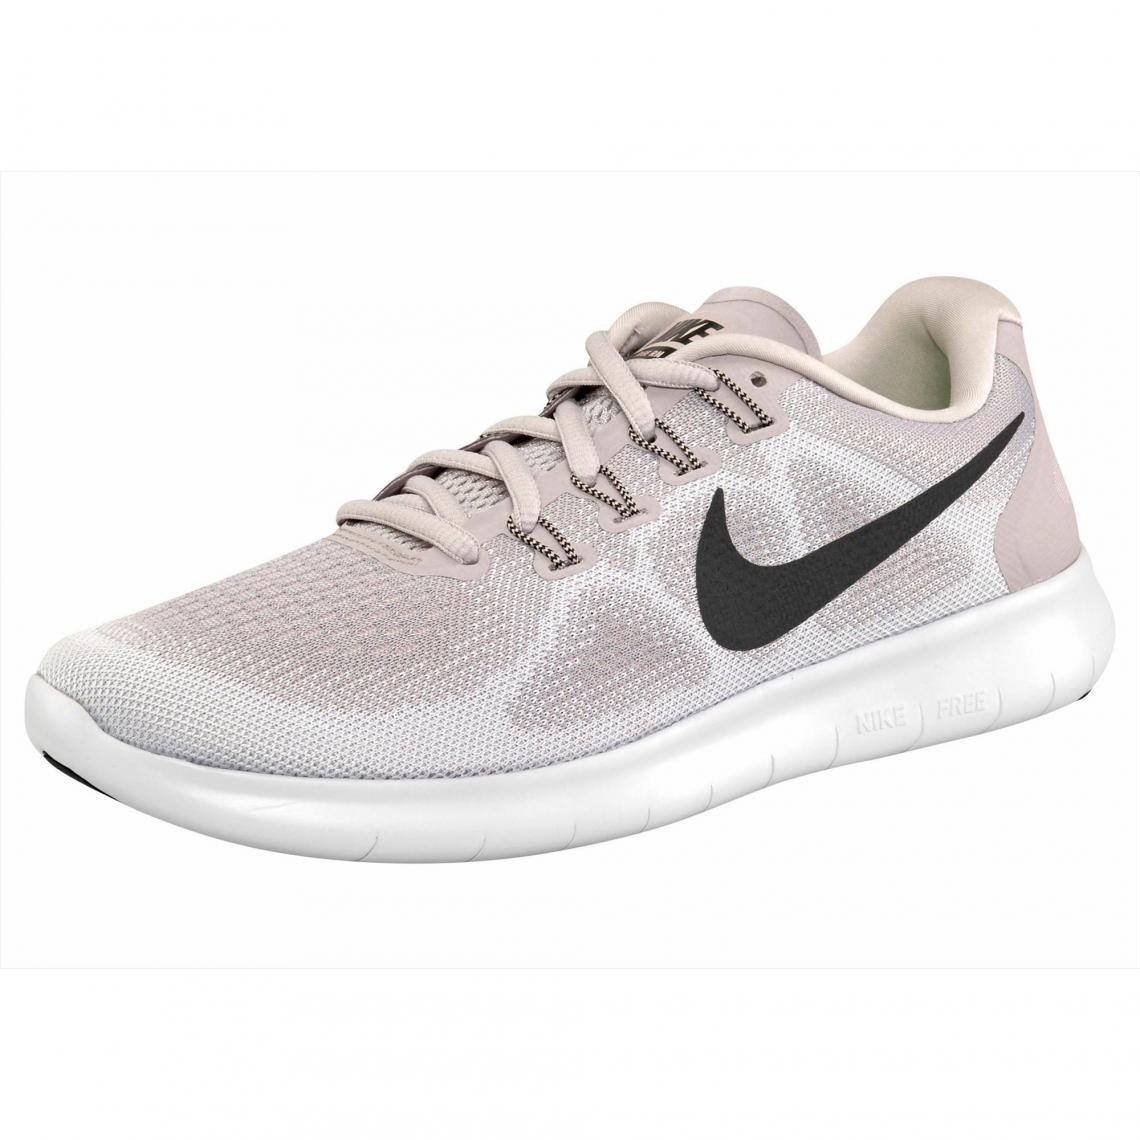 the best attitude 63f53 d37cd Nike Free Run 2 chaussures de sport femme - Sable Nike Femme